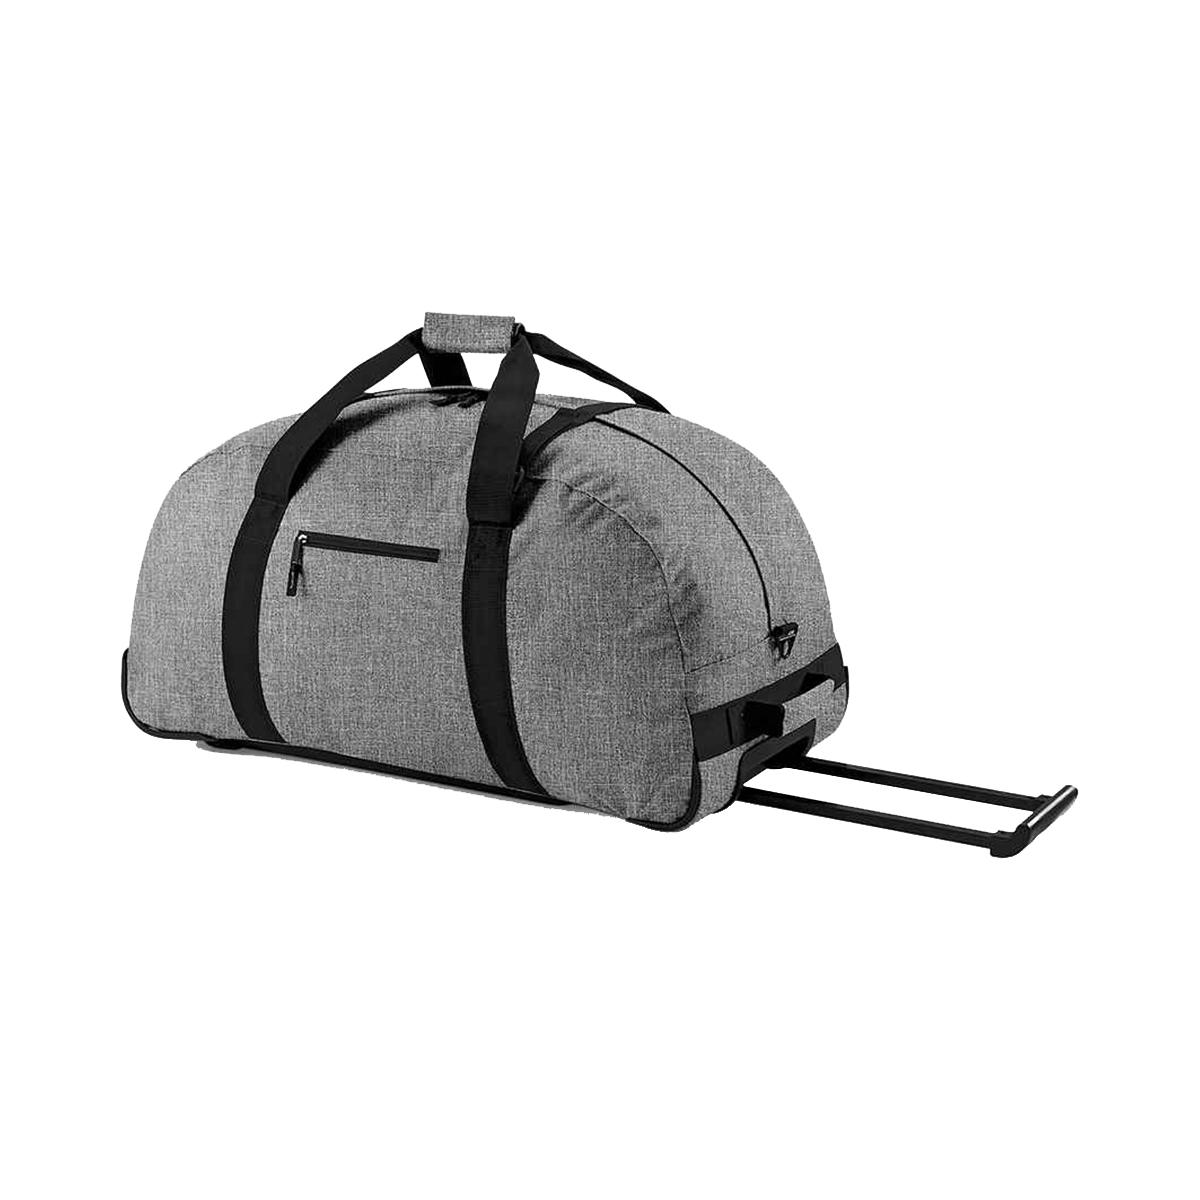 Bagbase Wheelie Holdall / Duffle Bag (105 Litres) (One Size) (Grey Marl)